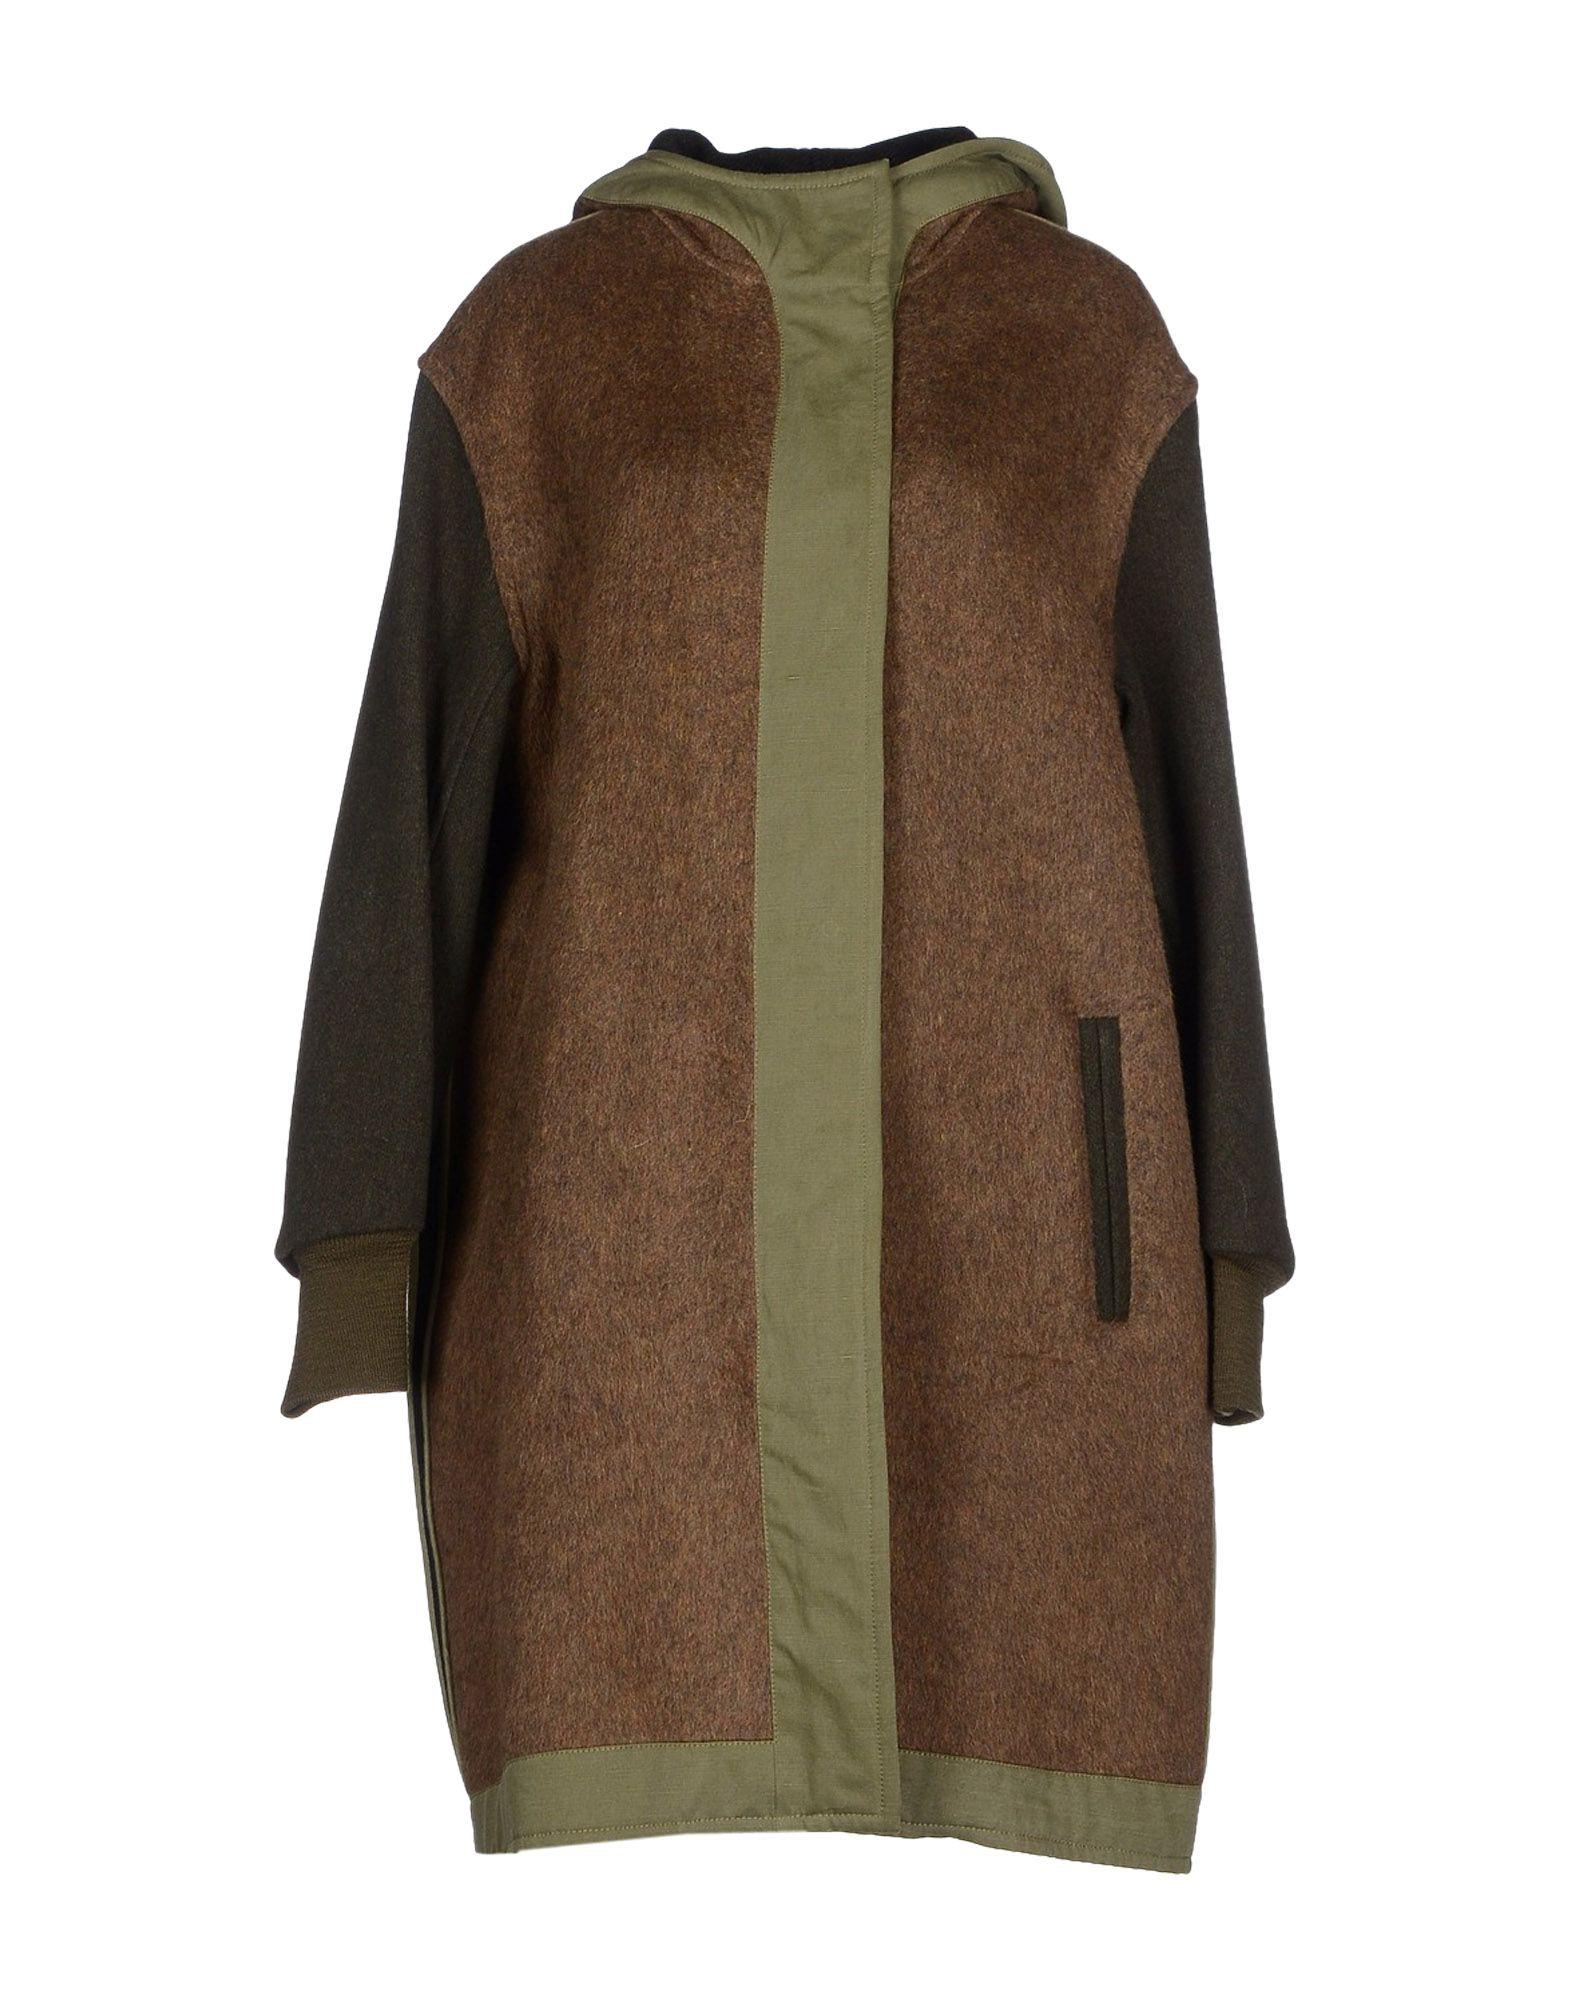 Étoile isabel marant Coat in Green (Dark green) | Lyst